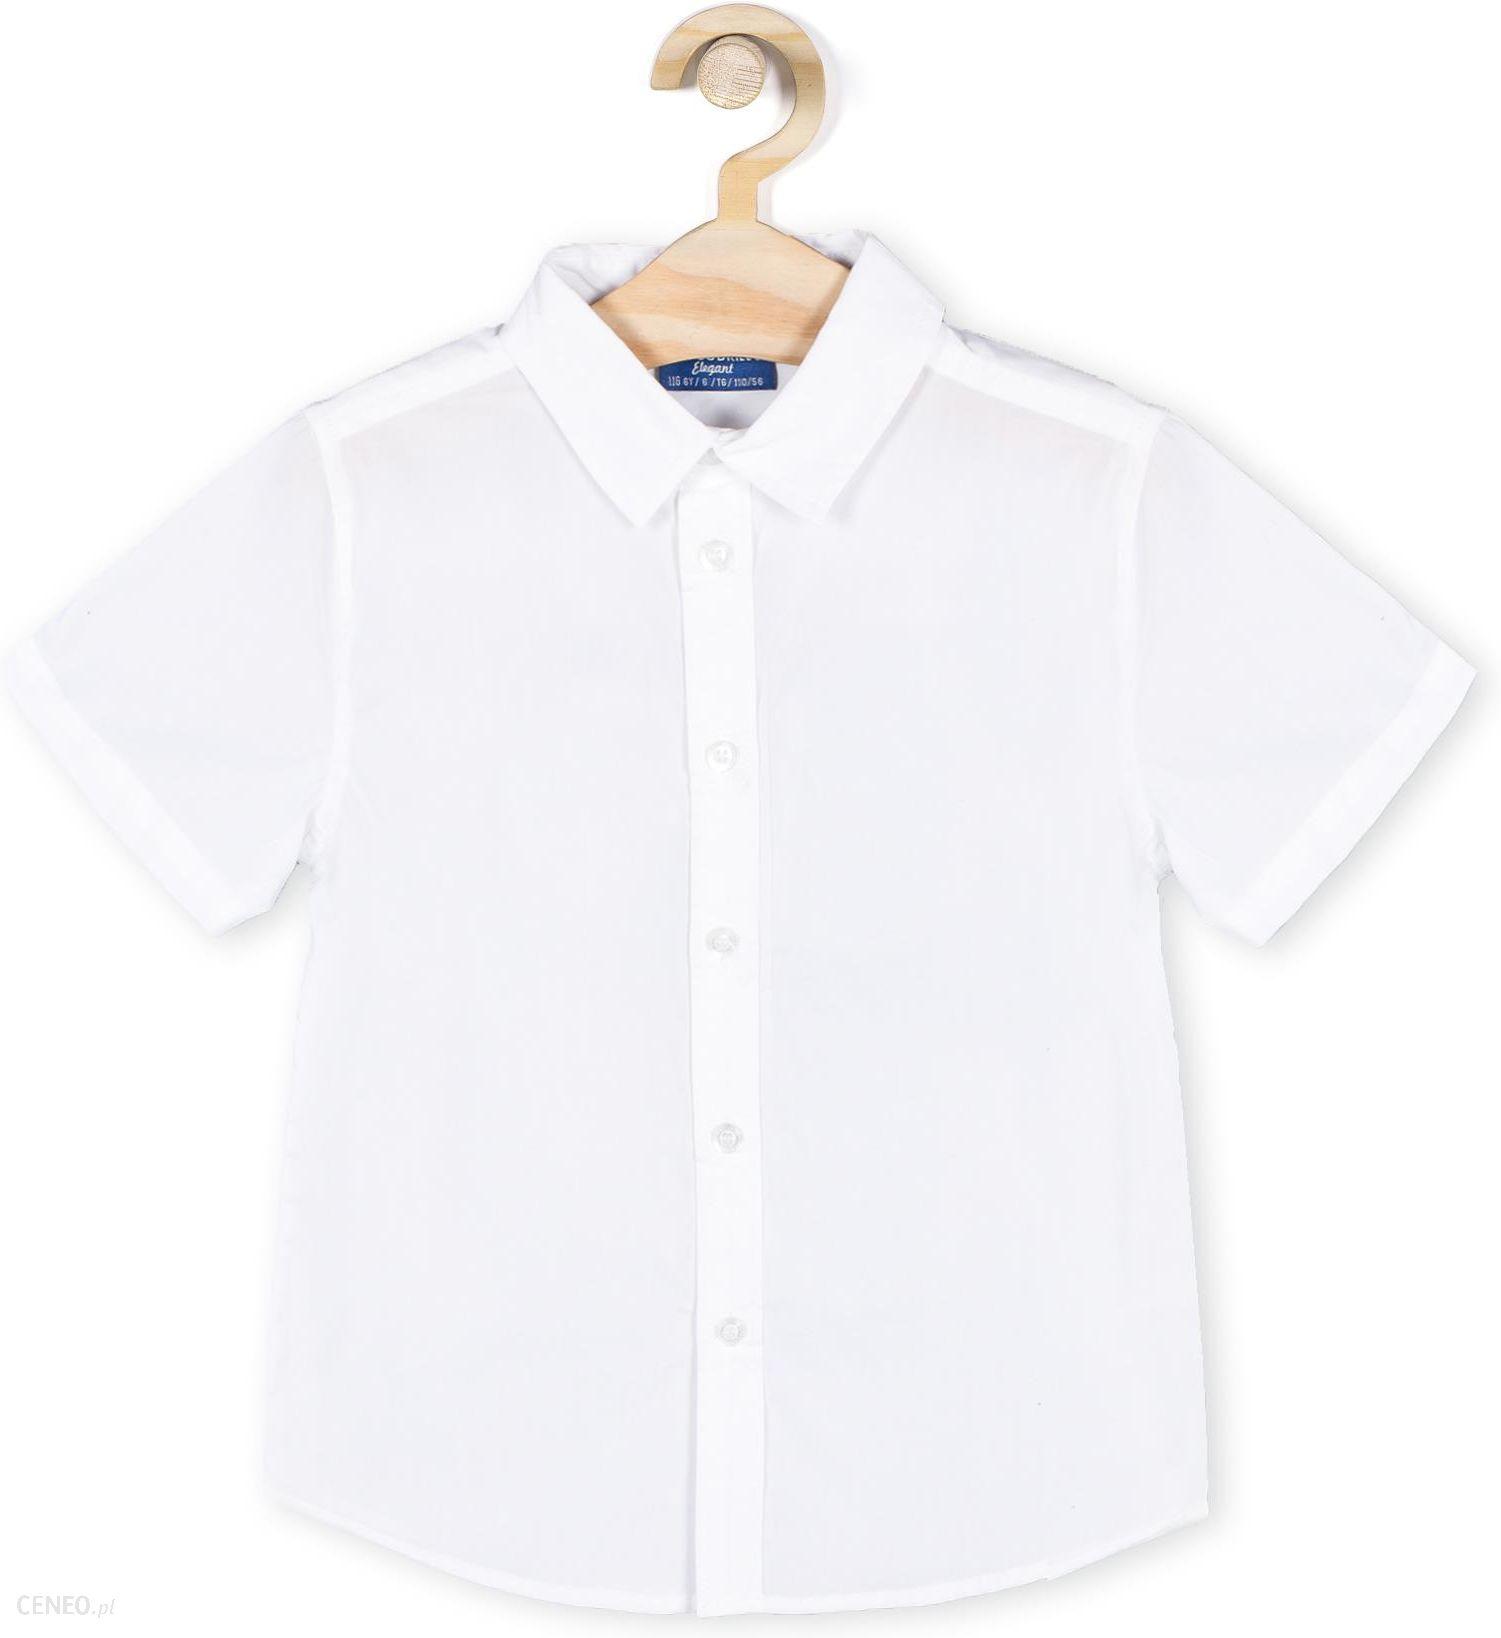 Koszula dla chłopca Coccodrillo Coccodrillo Ceny i  UKFJC